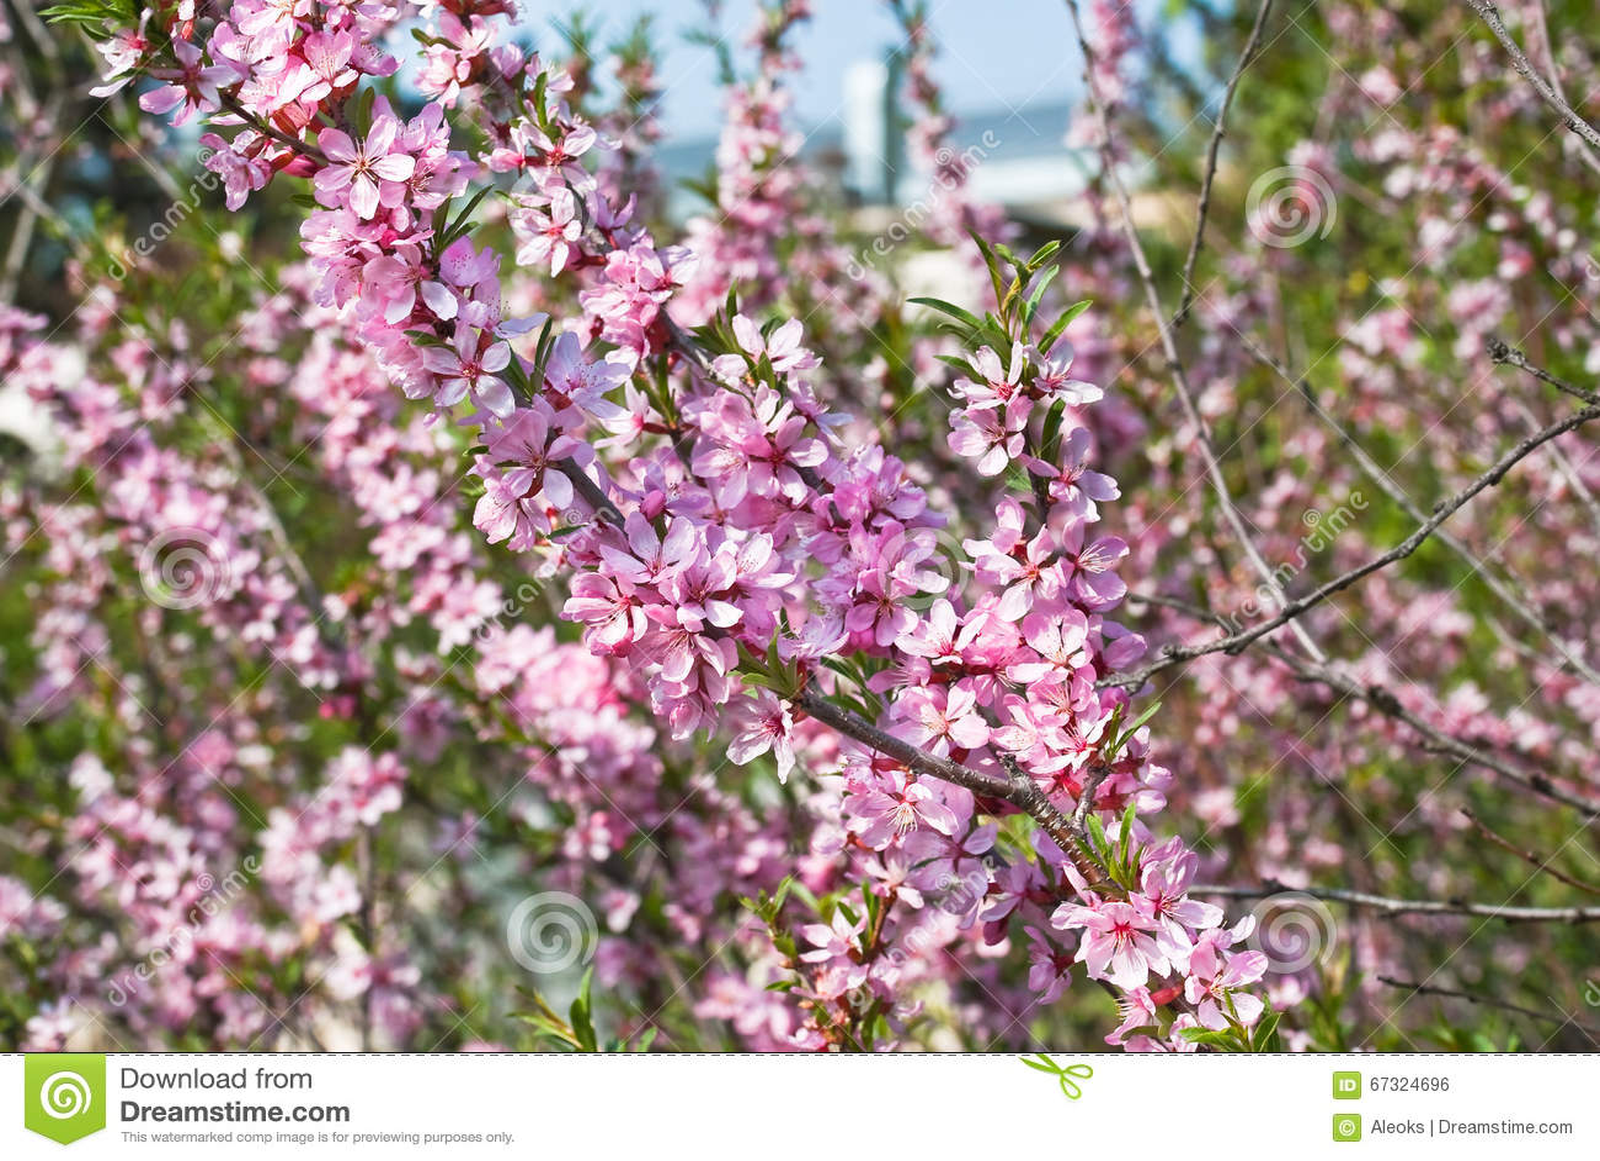 Flowering almond steppe stock photo image of bush plum 67324696 download comp mightylinksfo